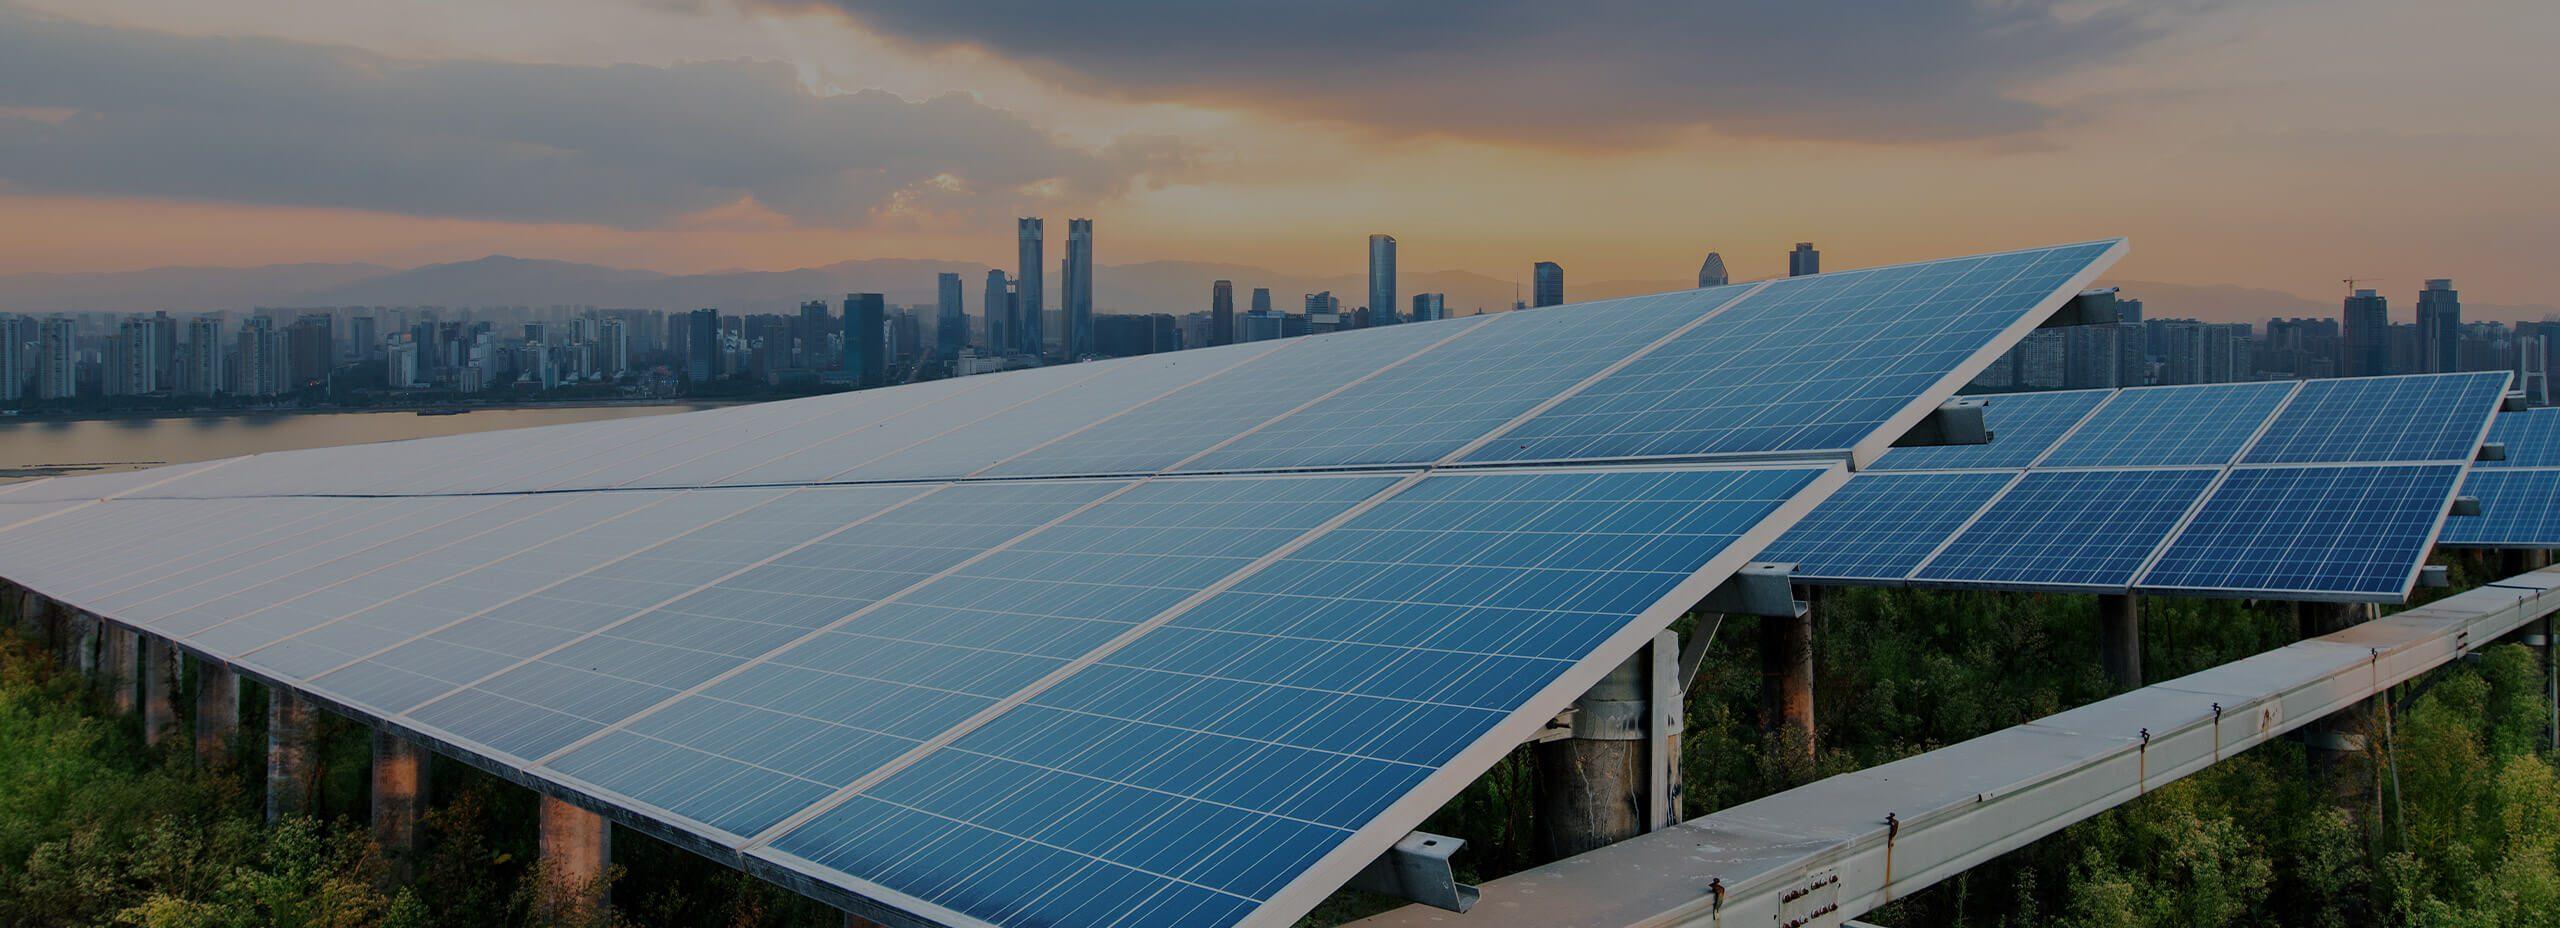 Cogeneration/Community Solar Programs